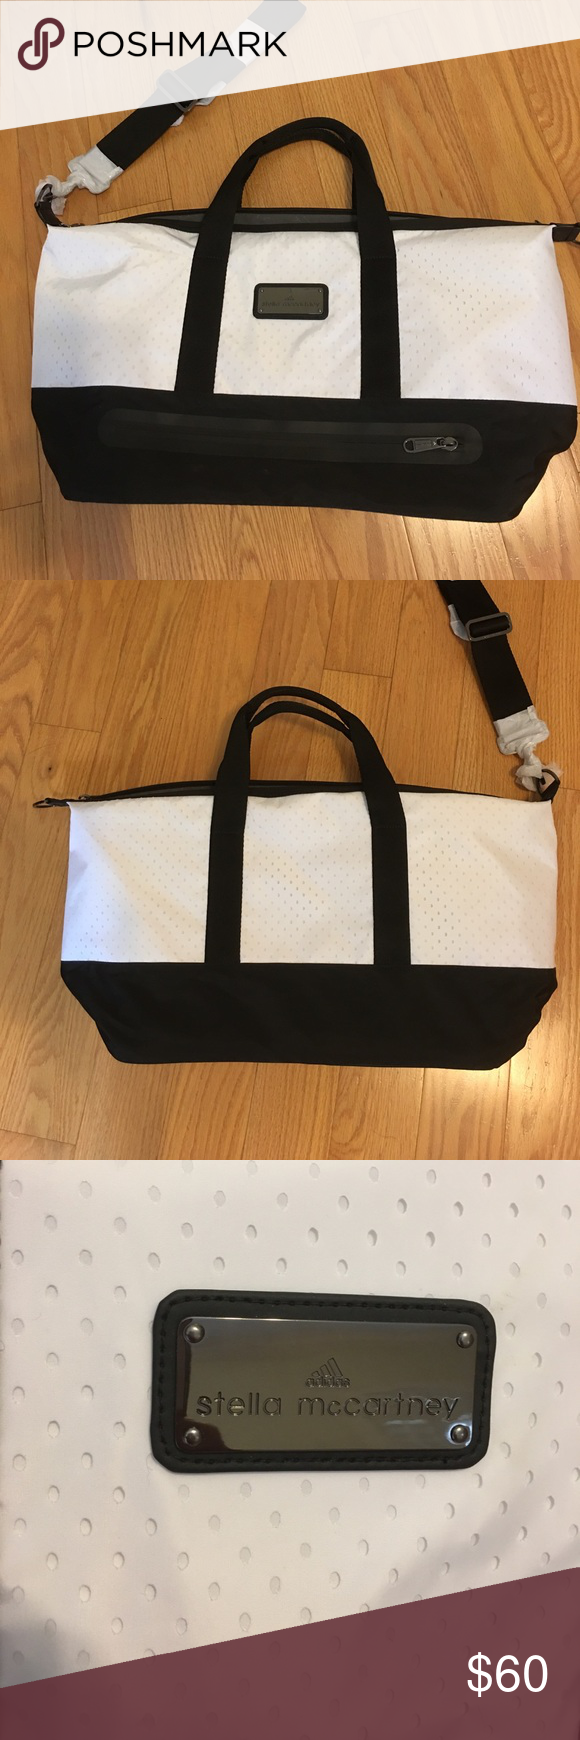 ad90ee8886c1 Adidas by Stella McCartney Gym bag Never used Gym bag. Lots of pockets